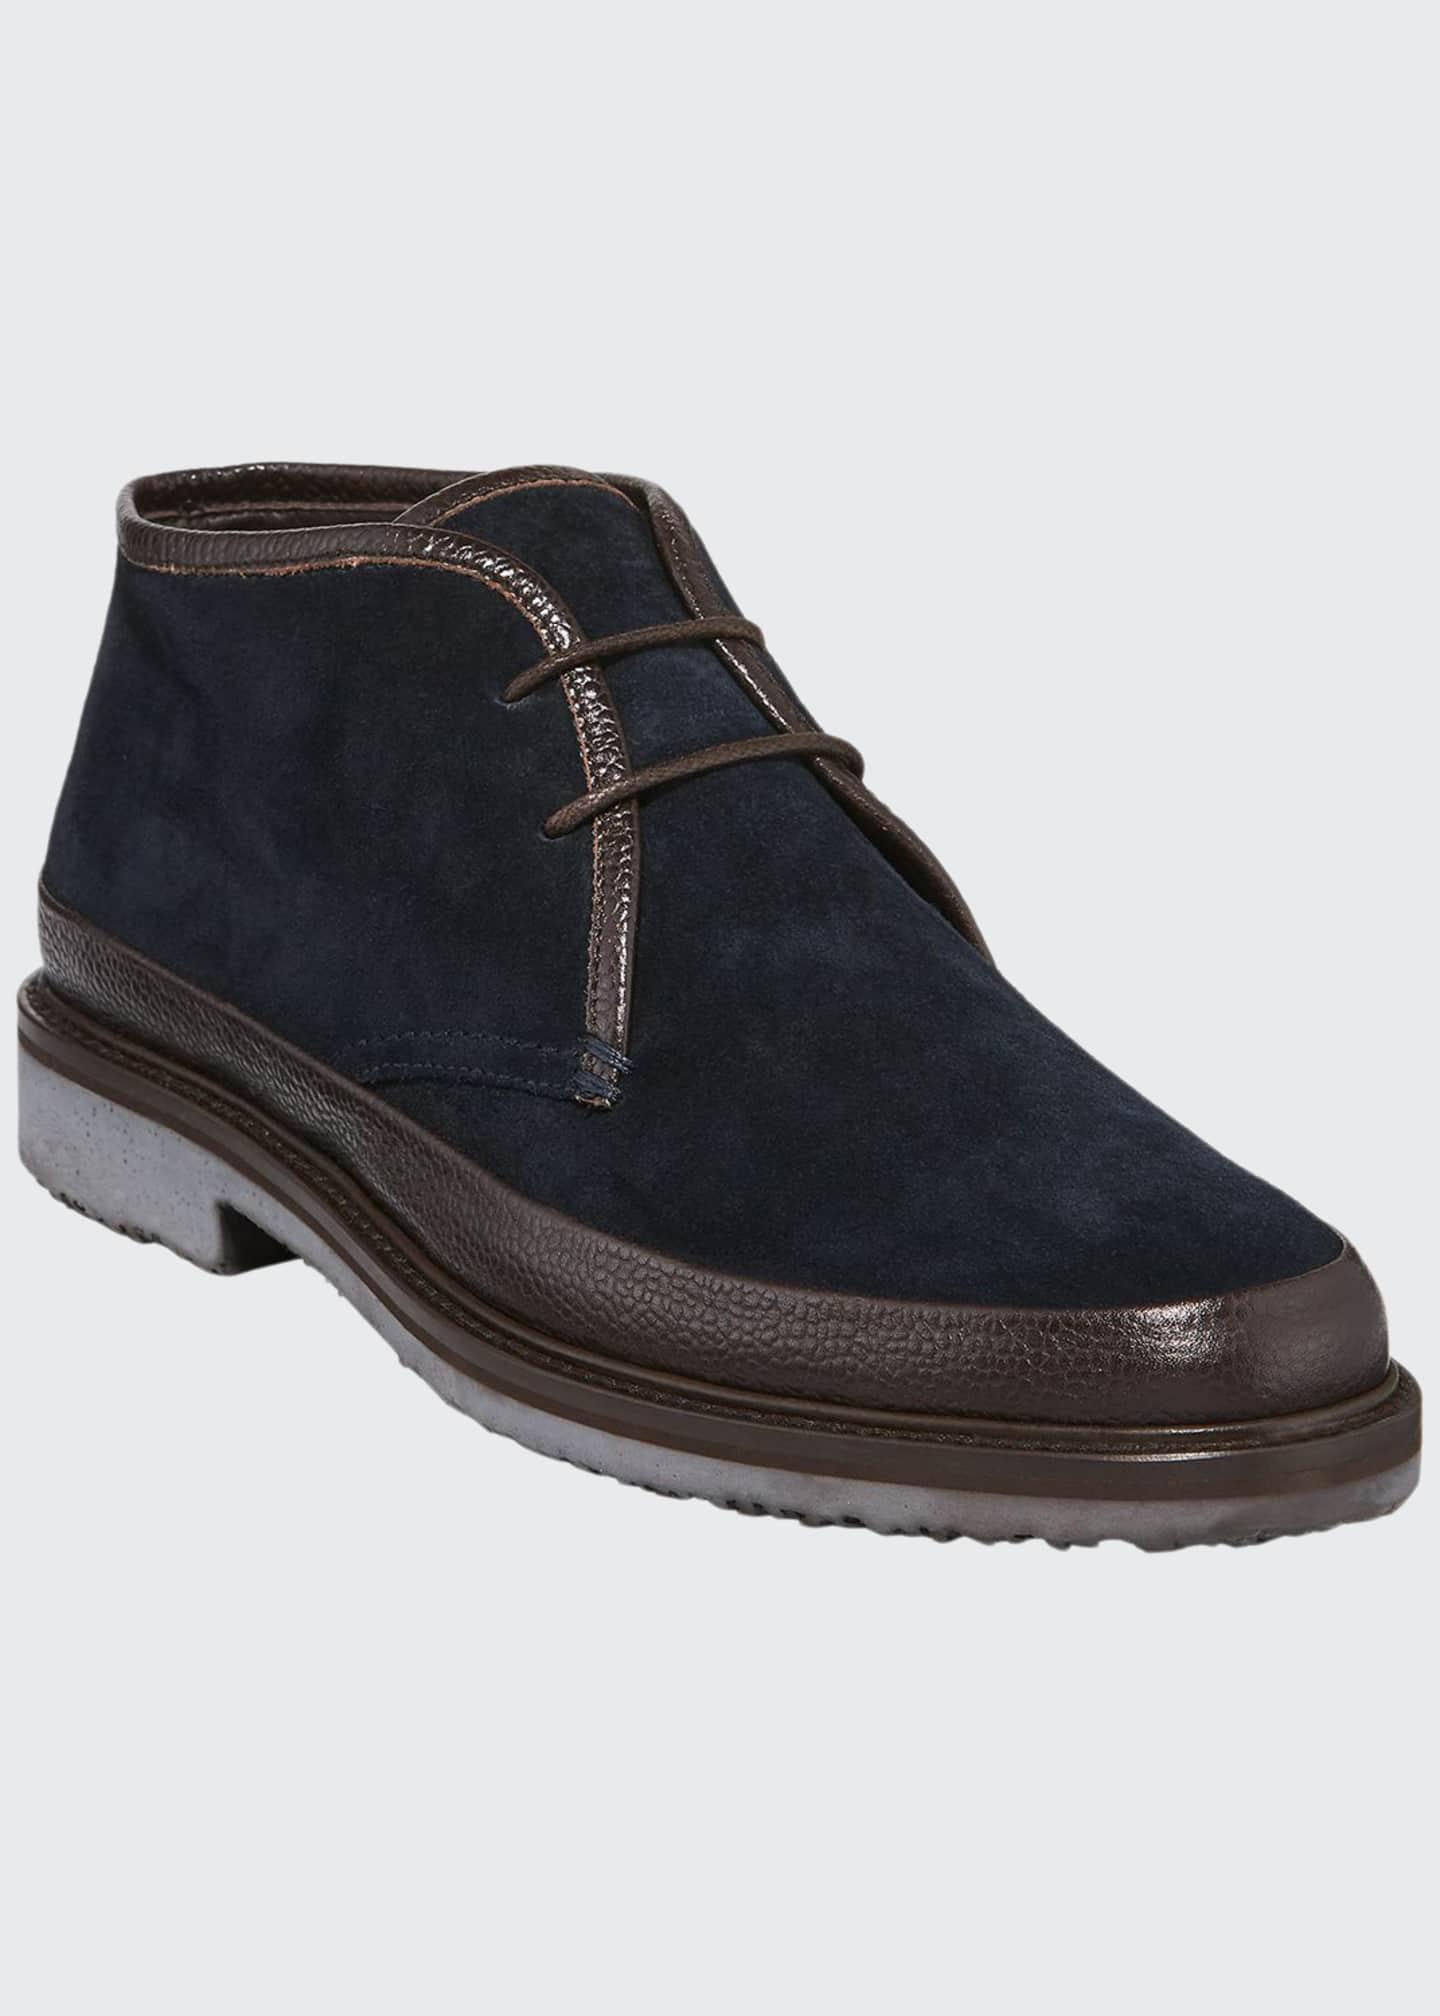 Ermenegildo Zegna Men's Trivero Suede Chukka Boots with